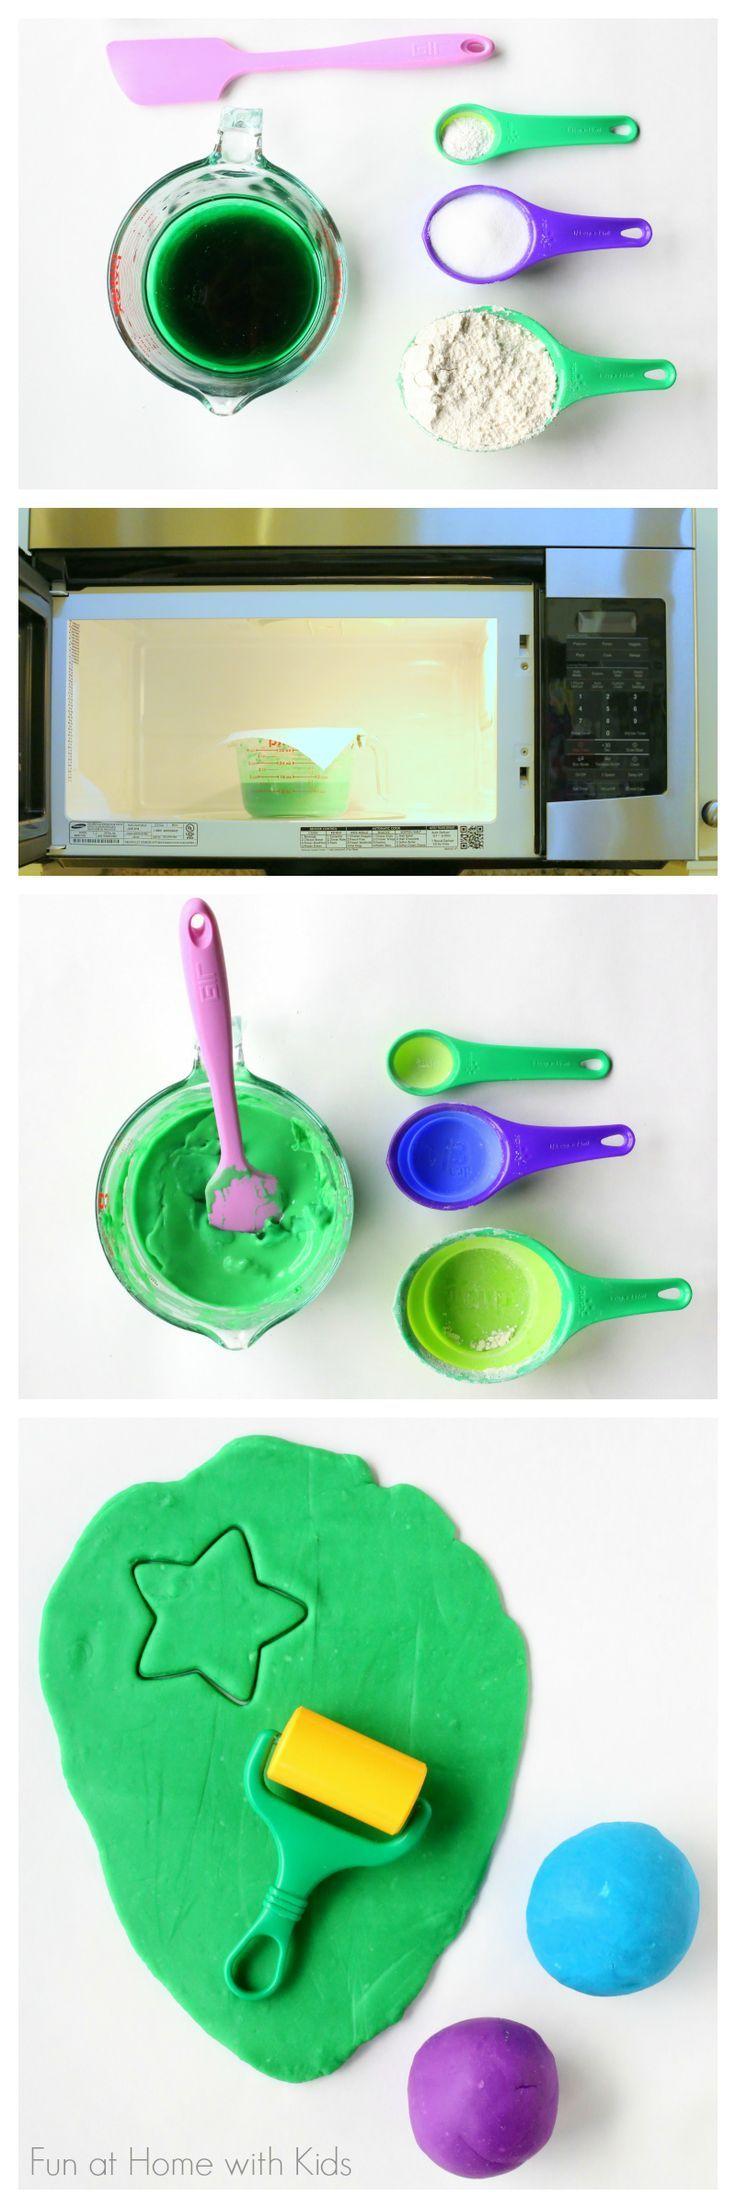 Easiest ever 5 MINUTE MICROWAVE homemade playdough